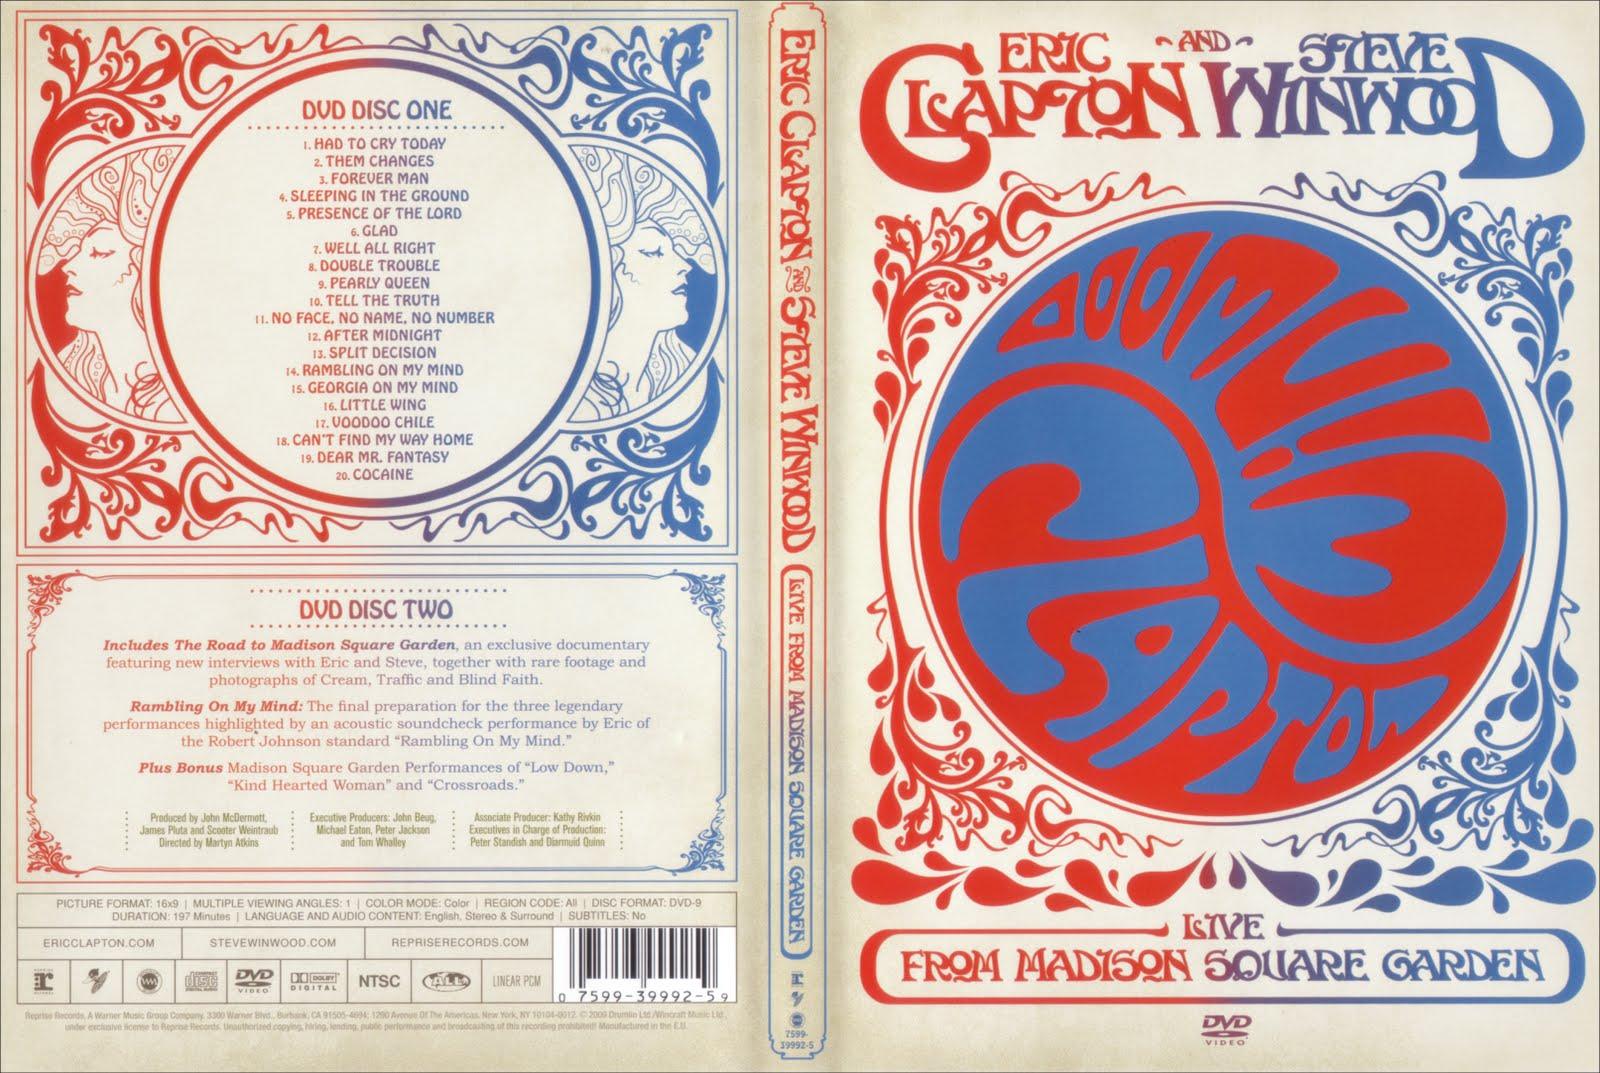 http://1.bp.blogspot.com/_se0zHB8H7oU/S_MXd9XEJMI/AAAAAAAACgI/W2Fvua6fAk4/s1600/Eric+Clapton+And+Steve+Winwood+-+Live+From+Madison+Square+Garden+-+Cover.jpg